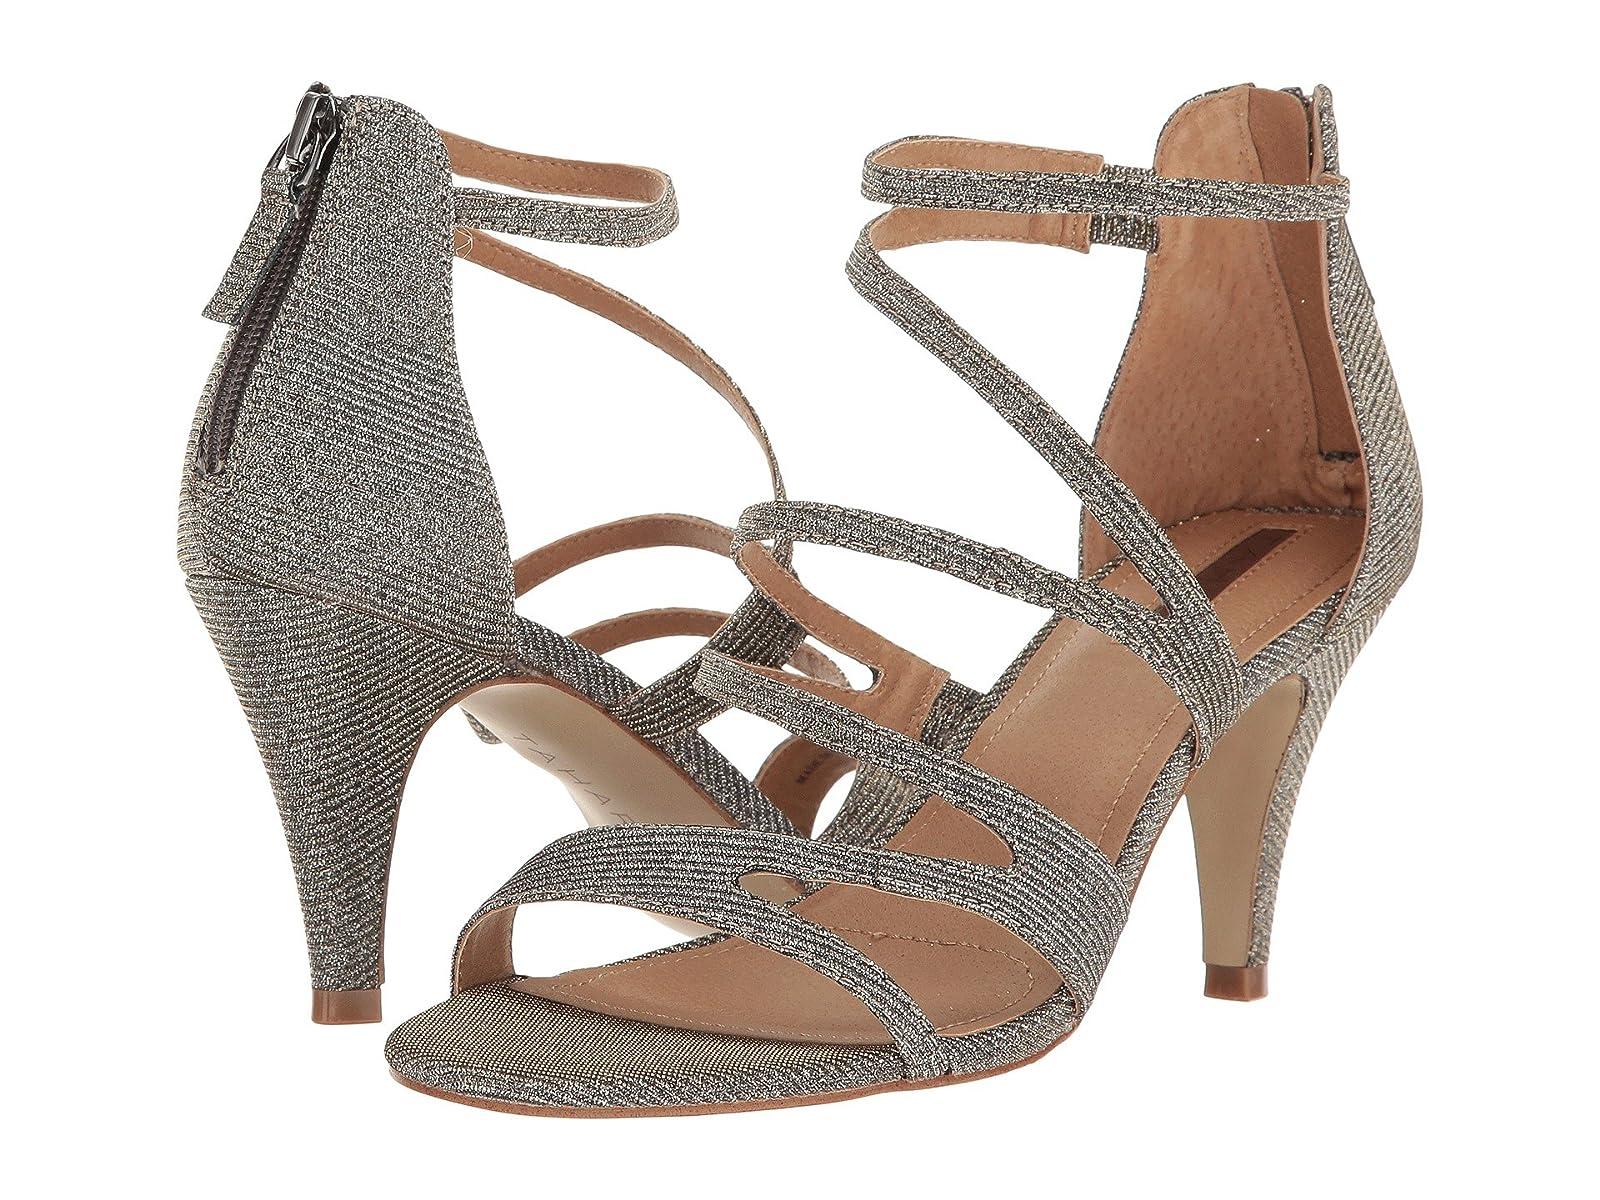 Tahari NinjaCheap and distinctive eye-catching shoes